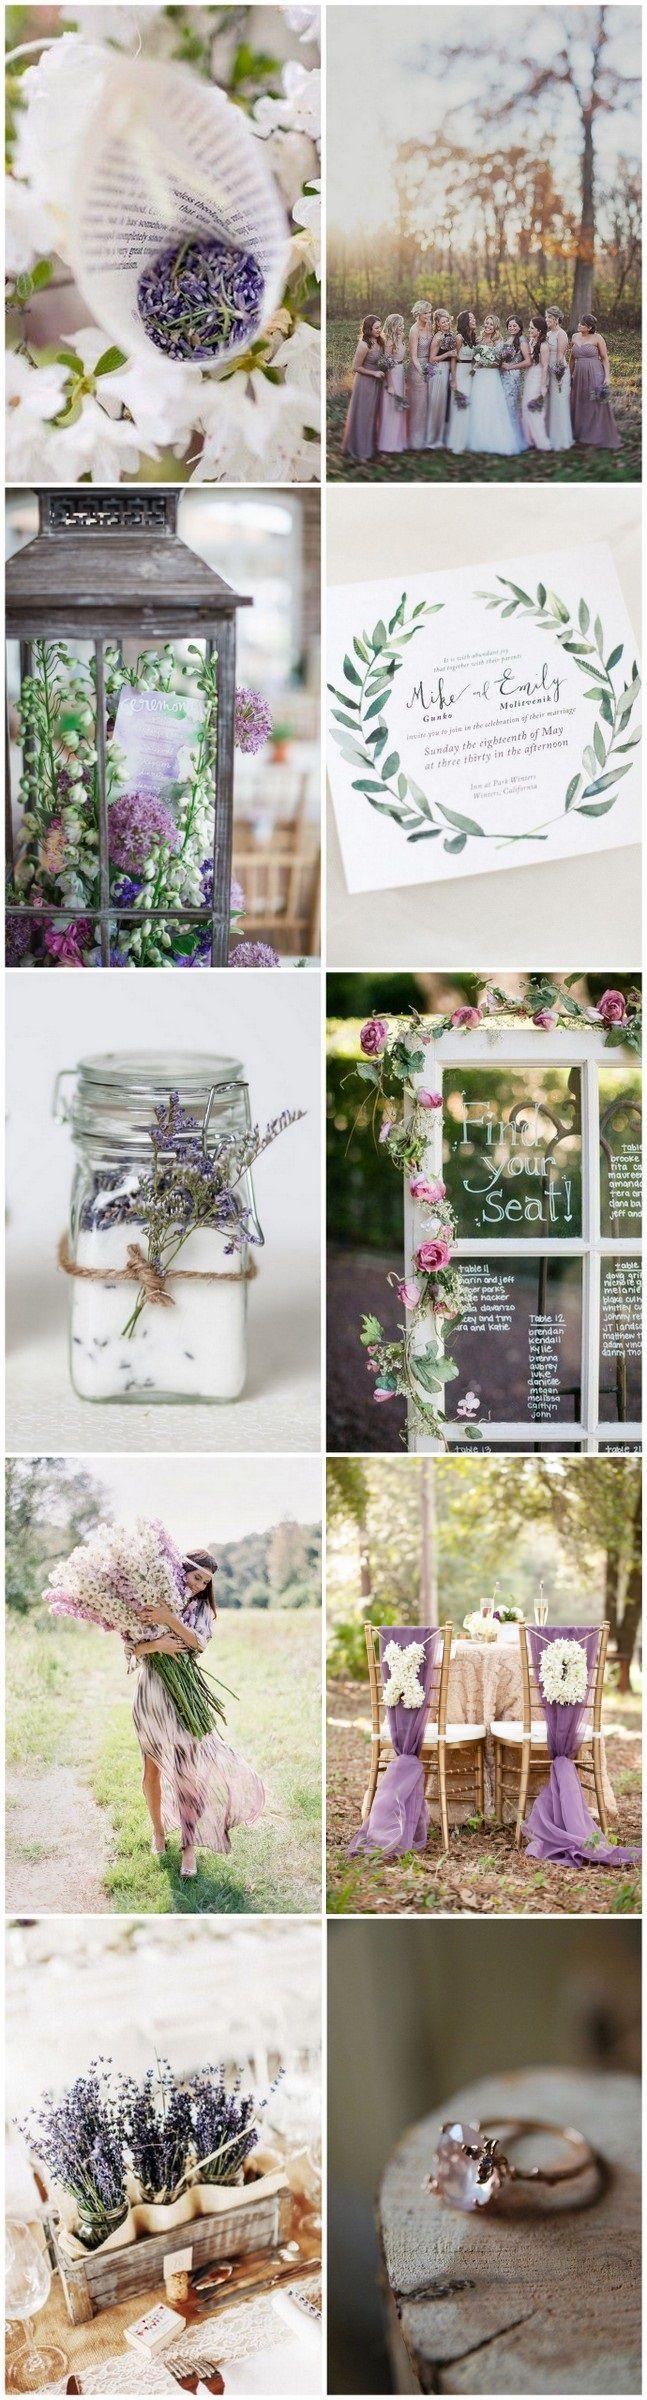 Dreamy Lavender Garden Wedding Inspiration | Garden weddings ...